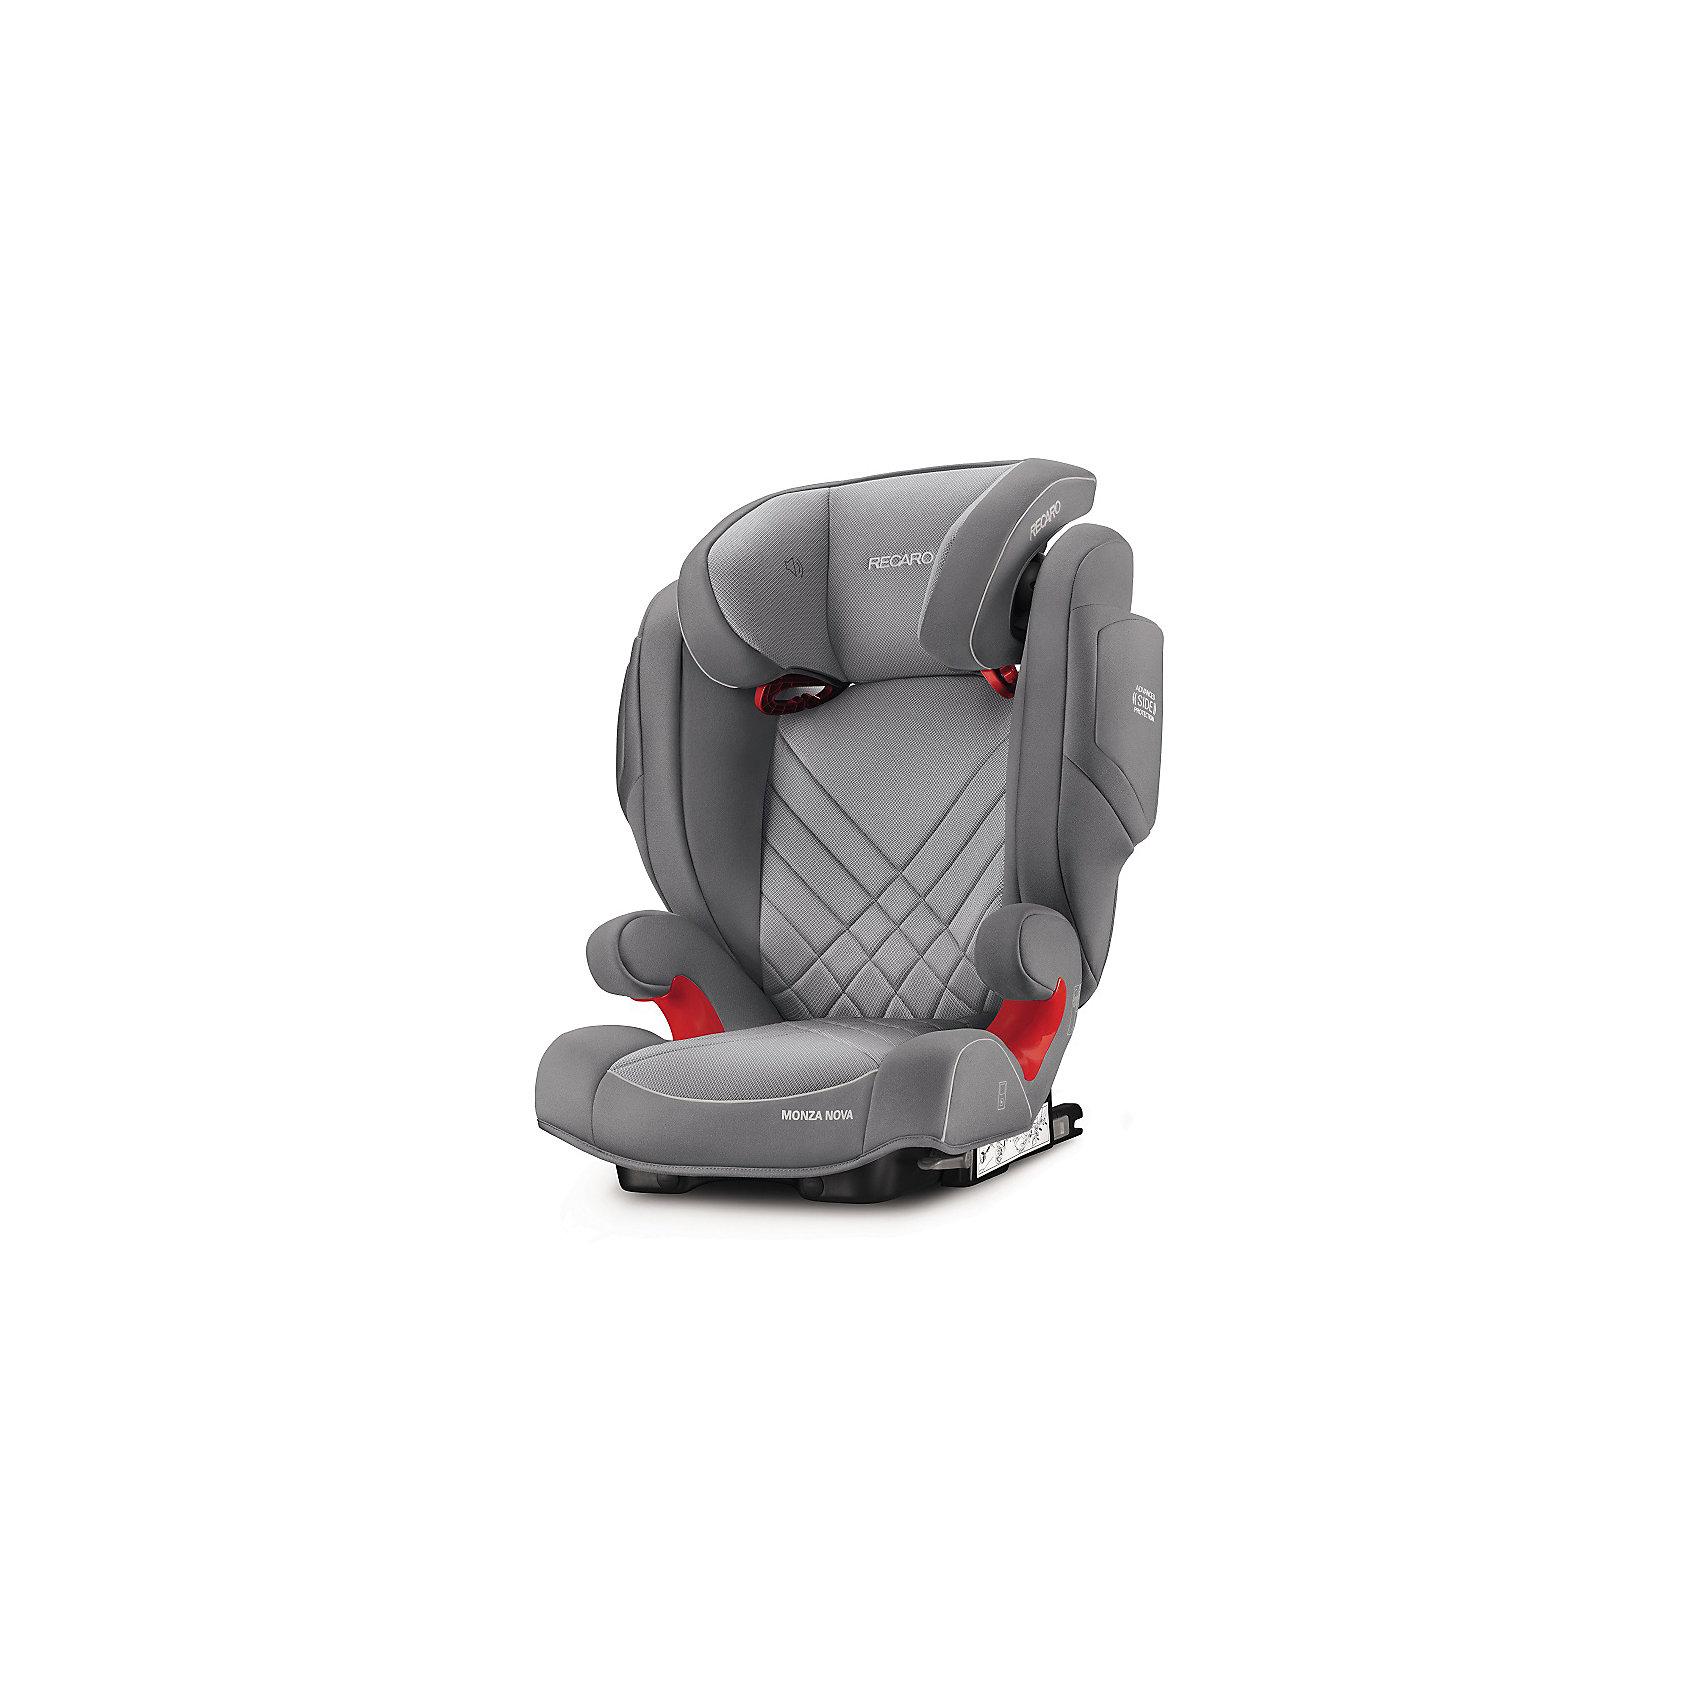 RECARO Автокресло Monza Nova 2 SF,  15-36 кг, Recaro, aluminum grey автокресло recaro monza nova 2 seatfix 15 36 кг perfomance black